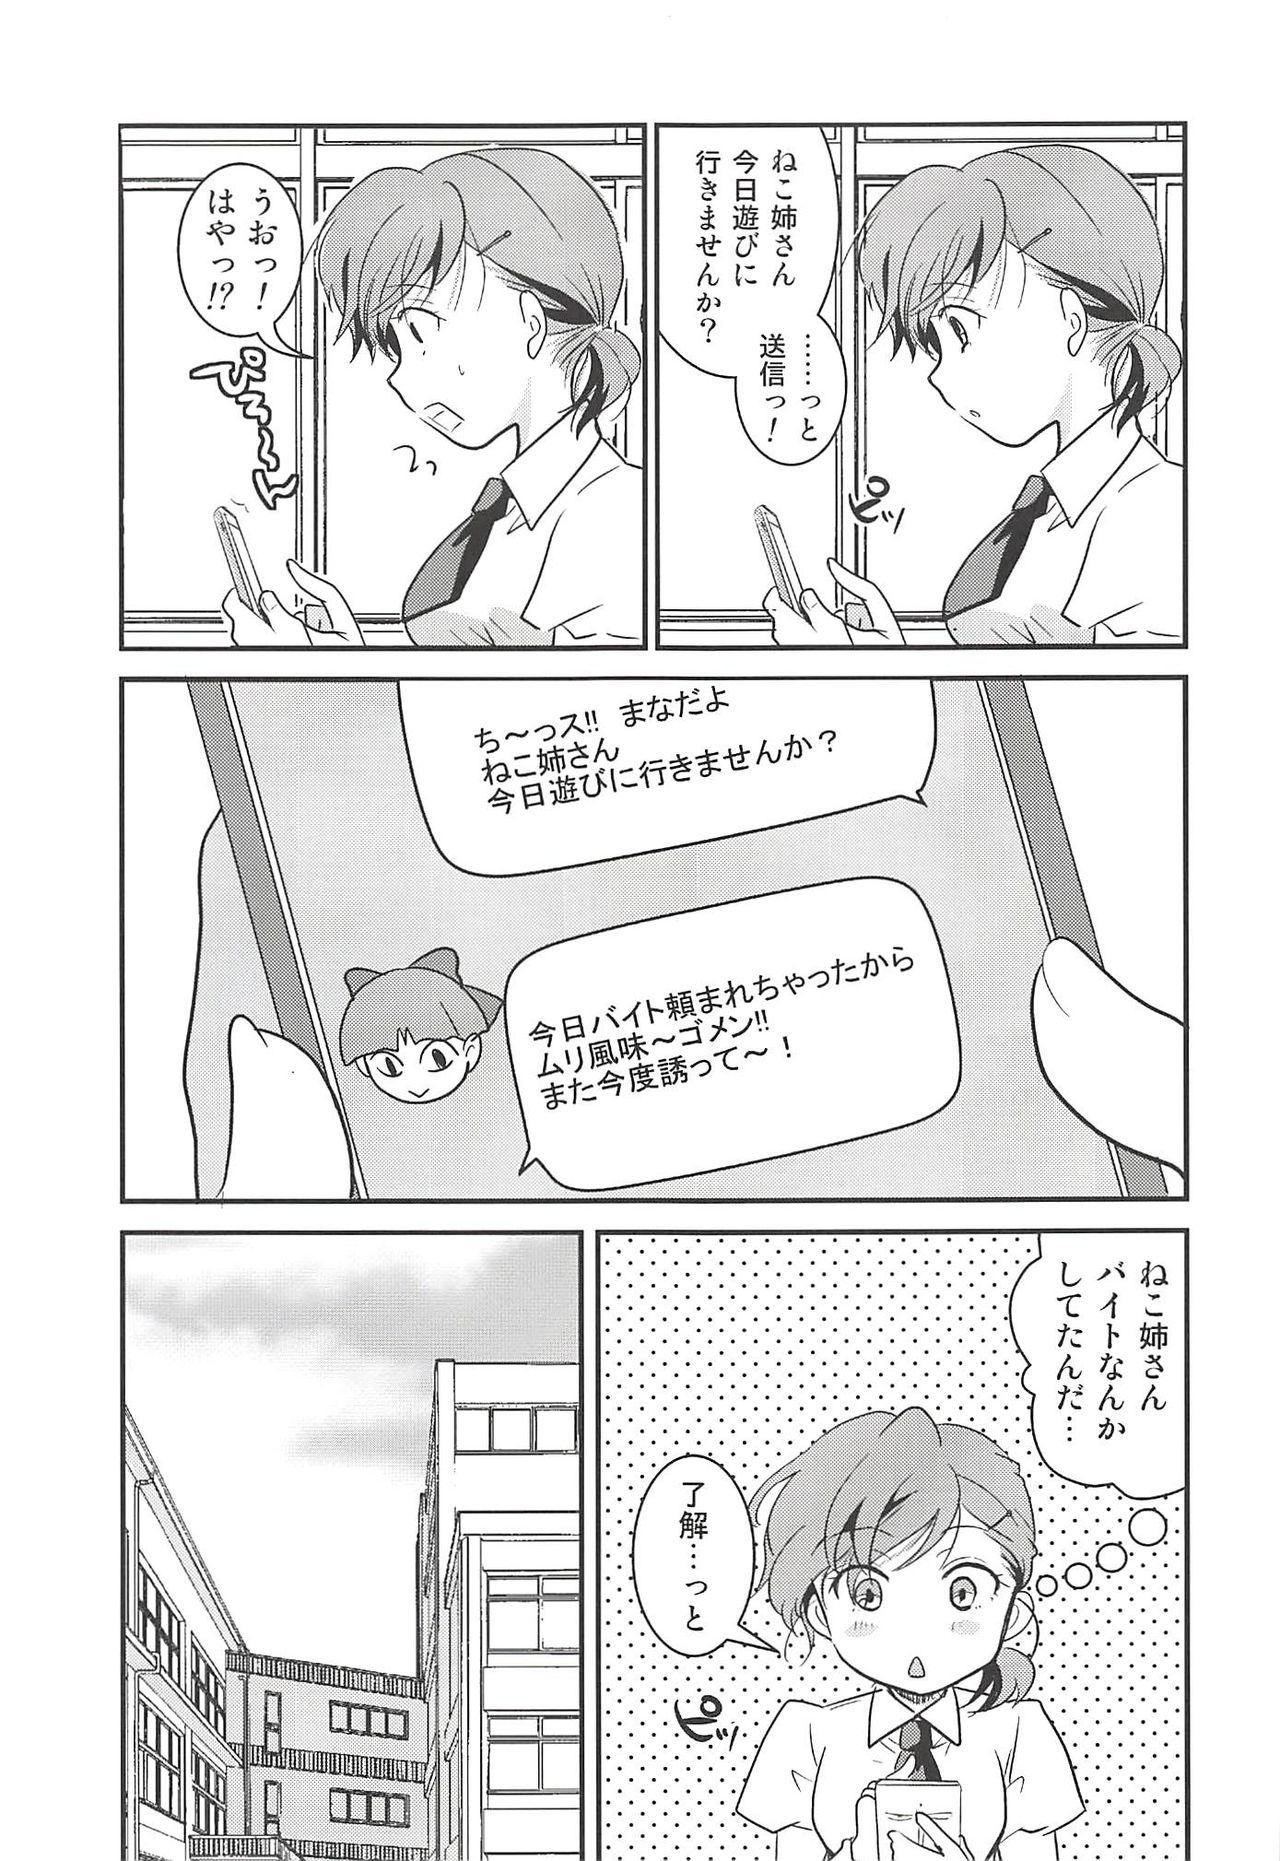 Neko Musume Suikan 3